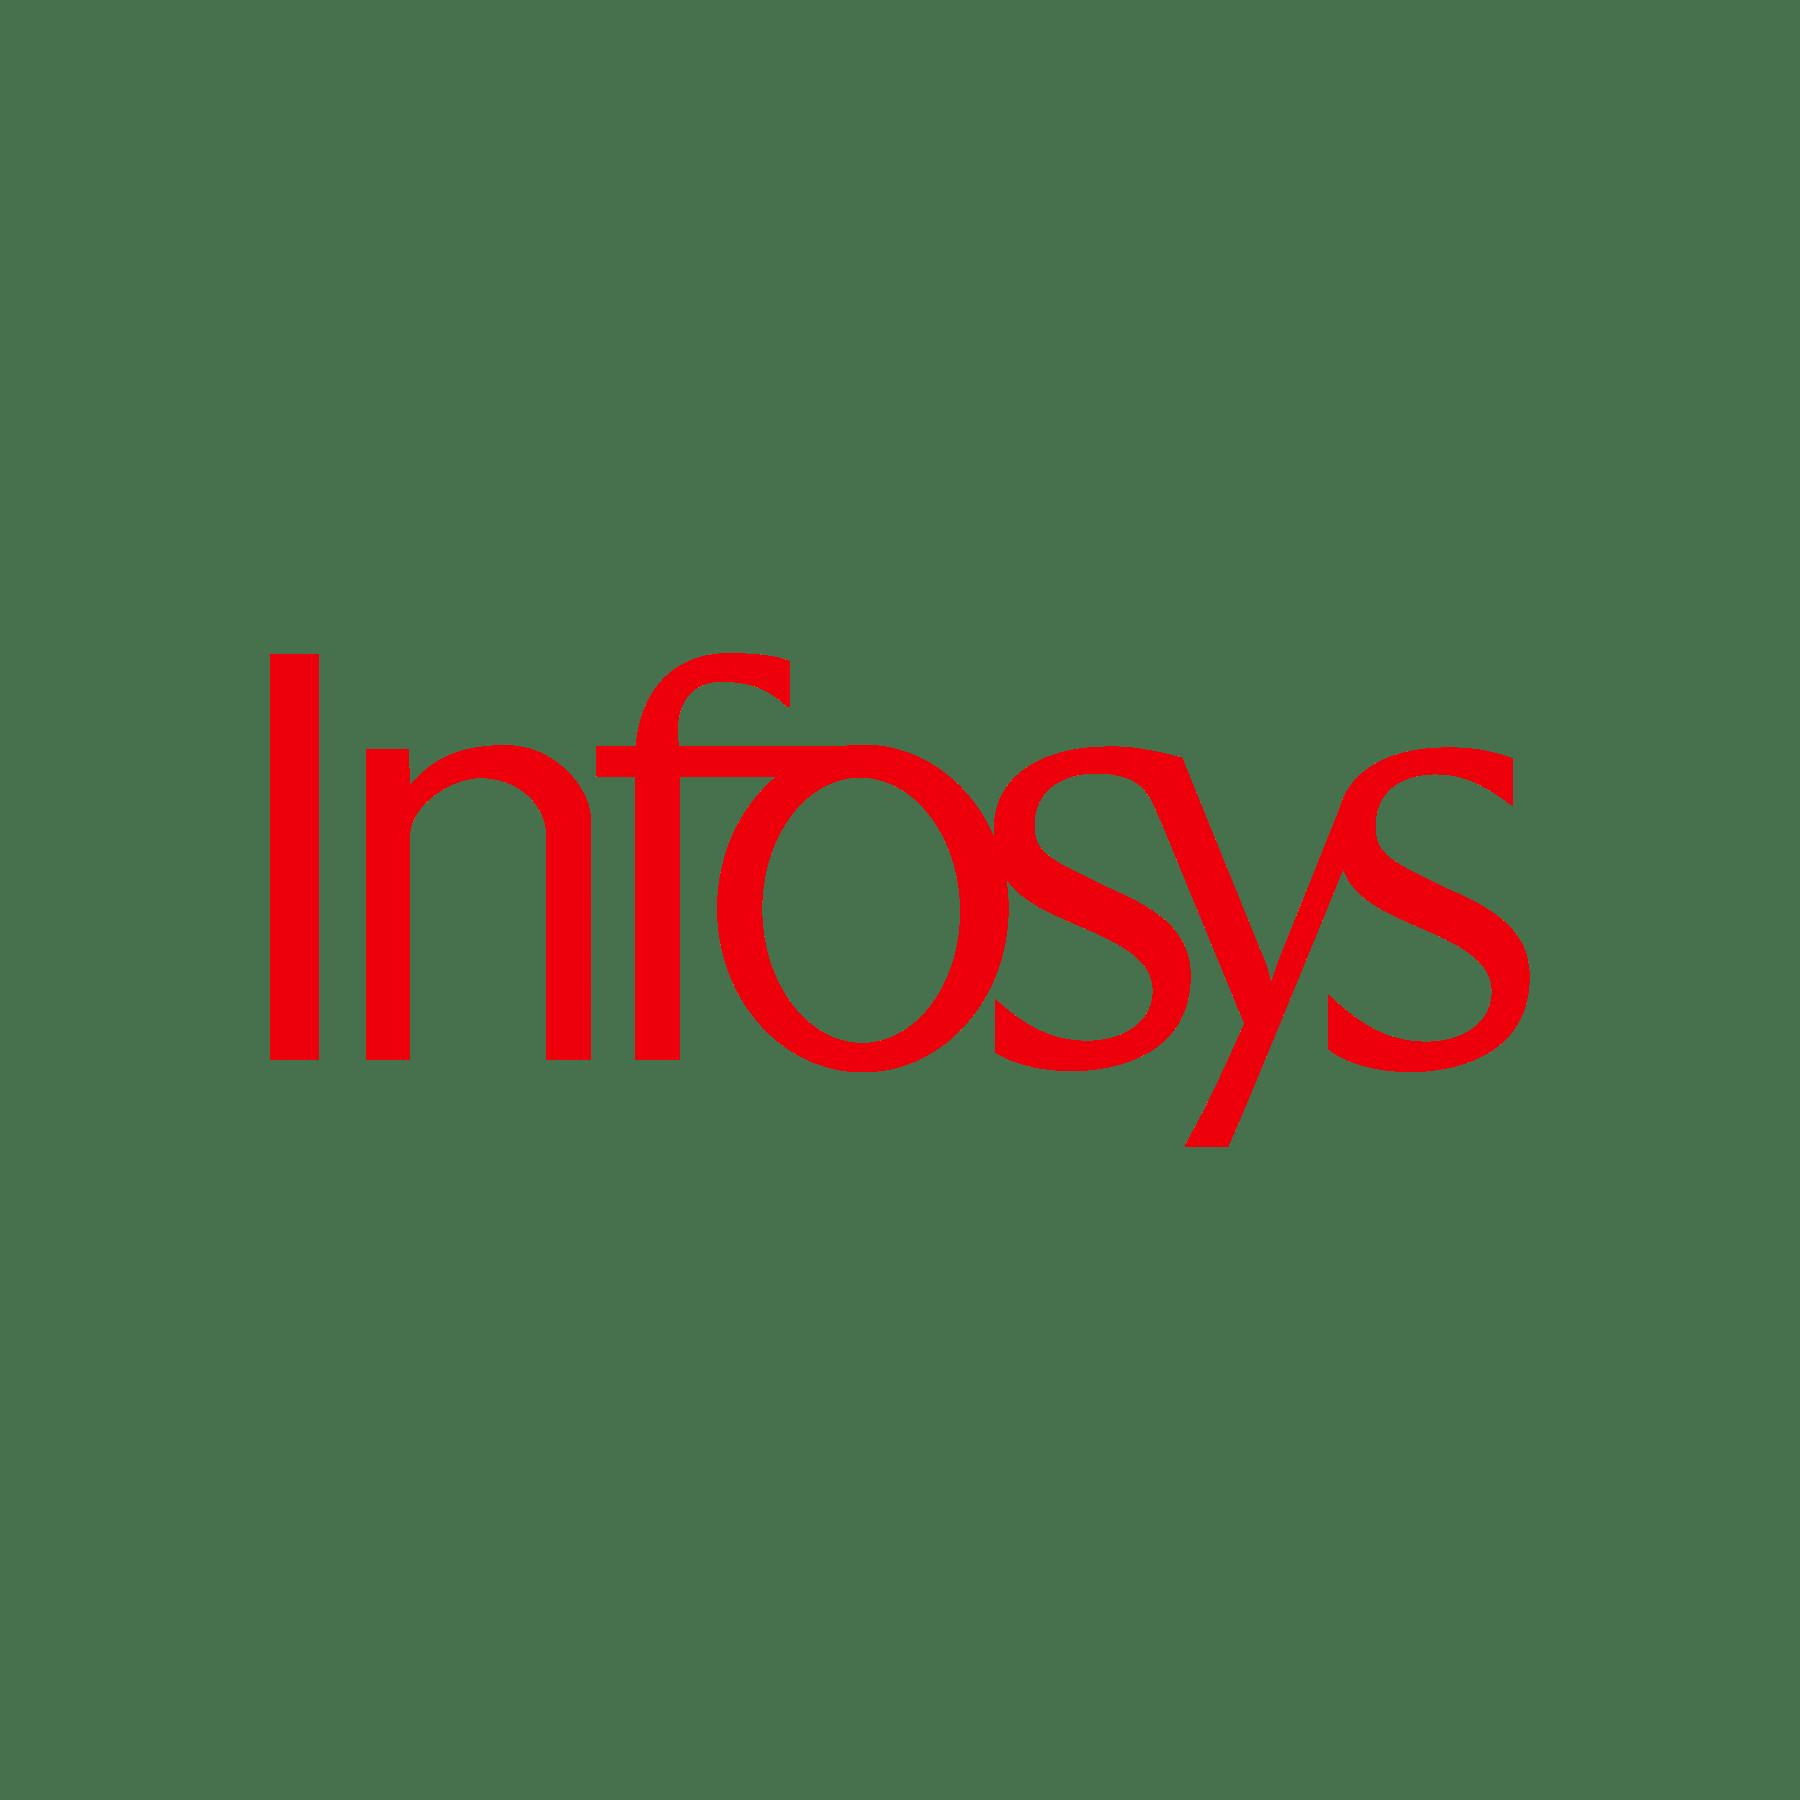 Infosys Transparent Gallery